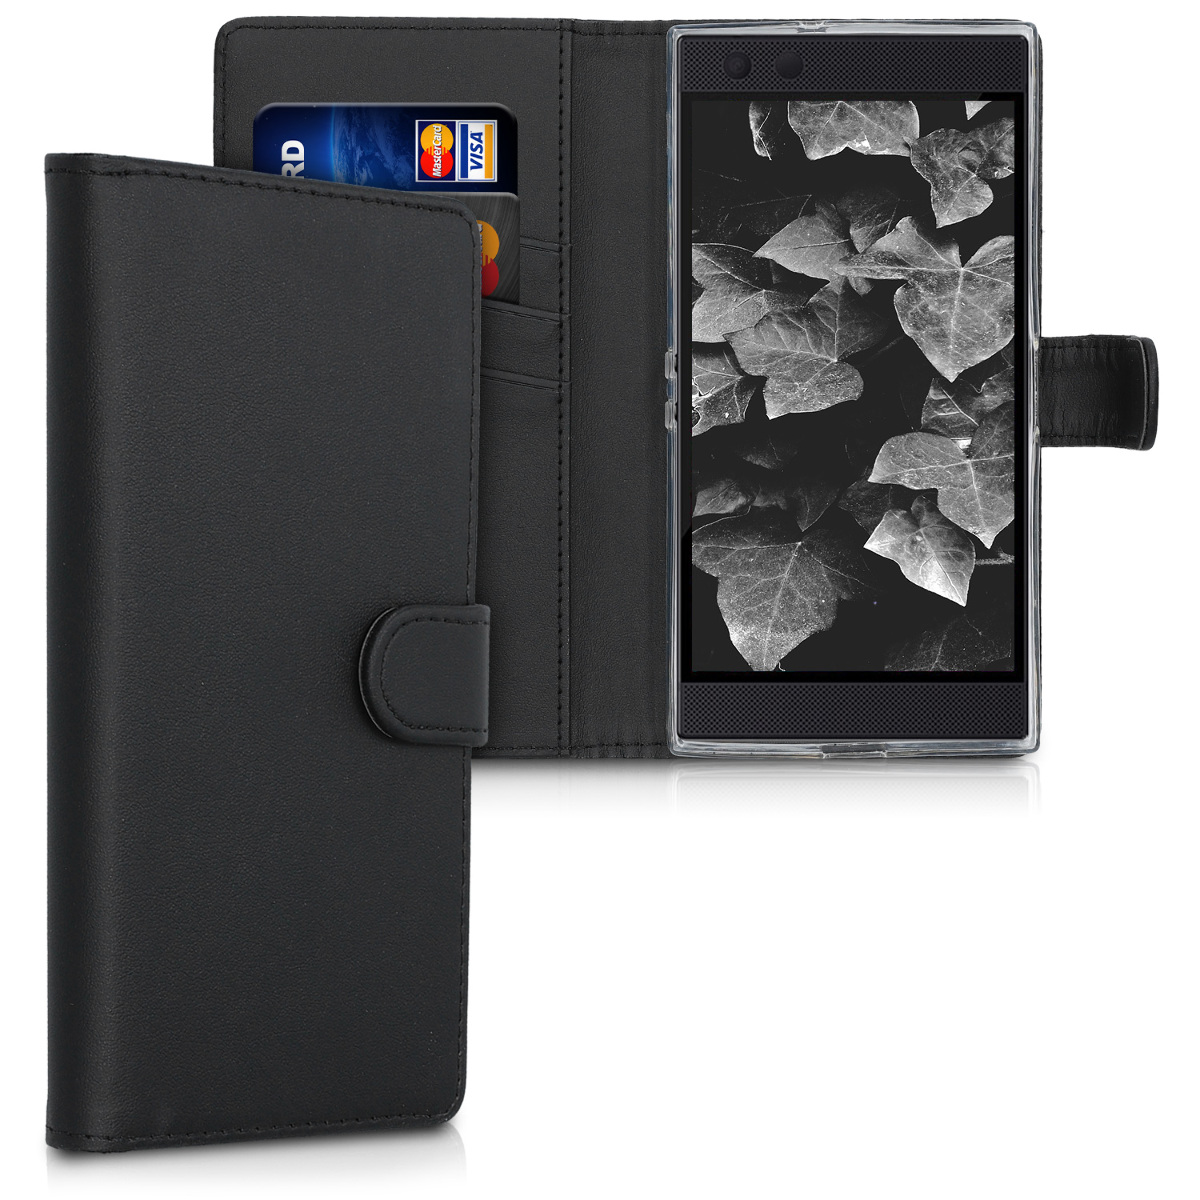 KW Θήκη - Πορτοφόλι Razer Phone 2 - Black (50625.01)